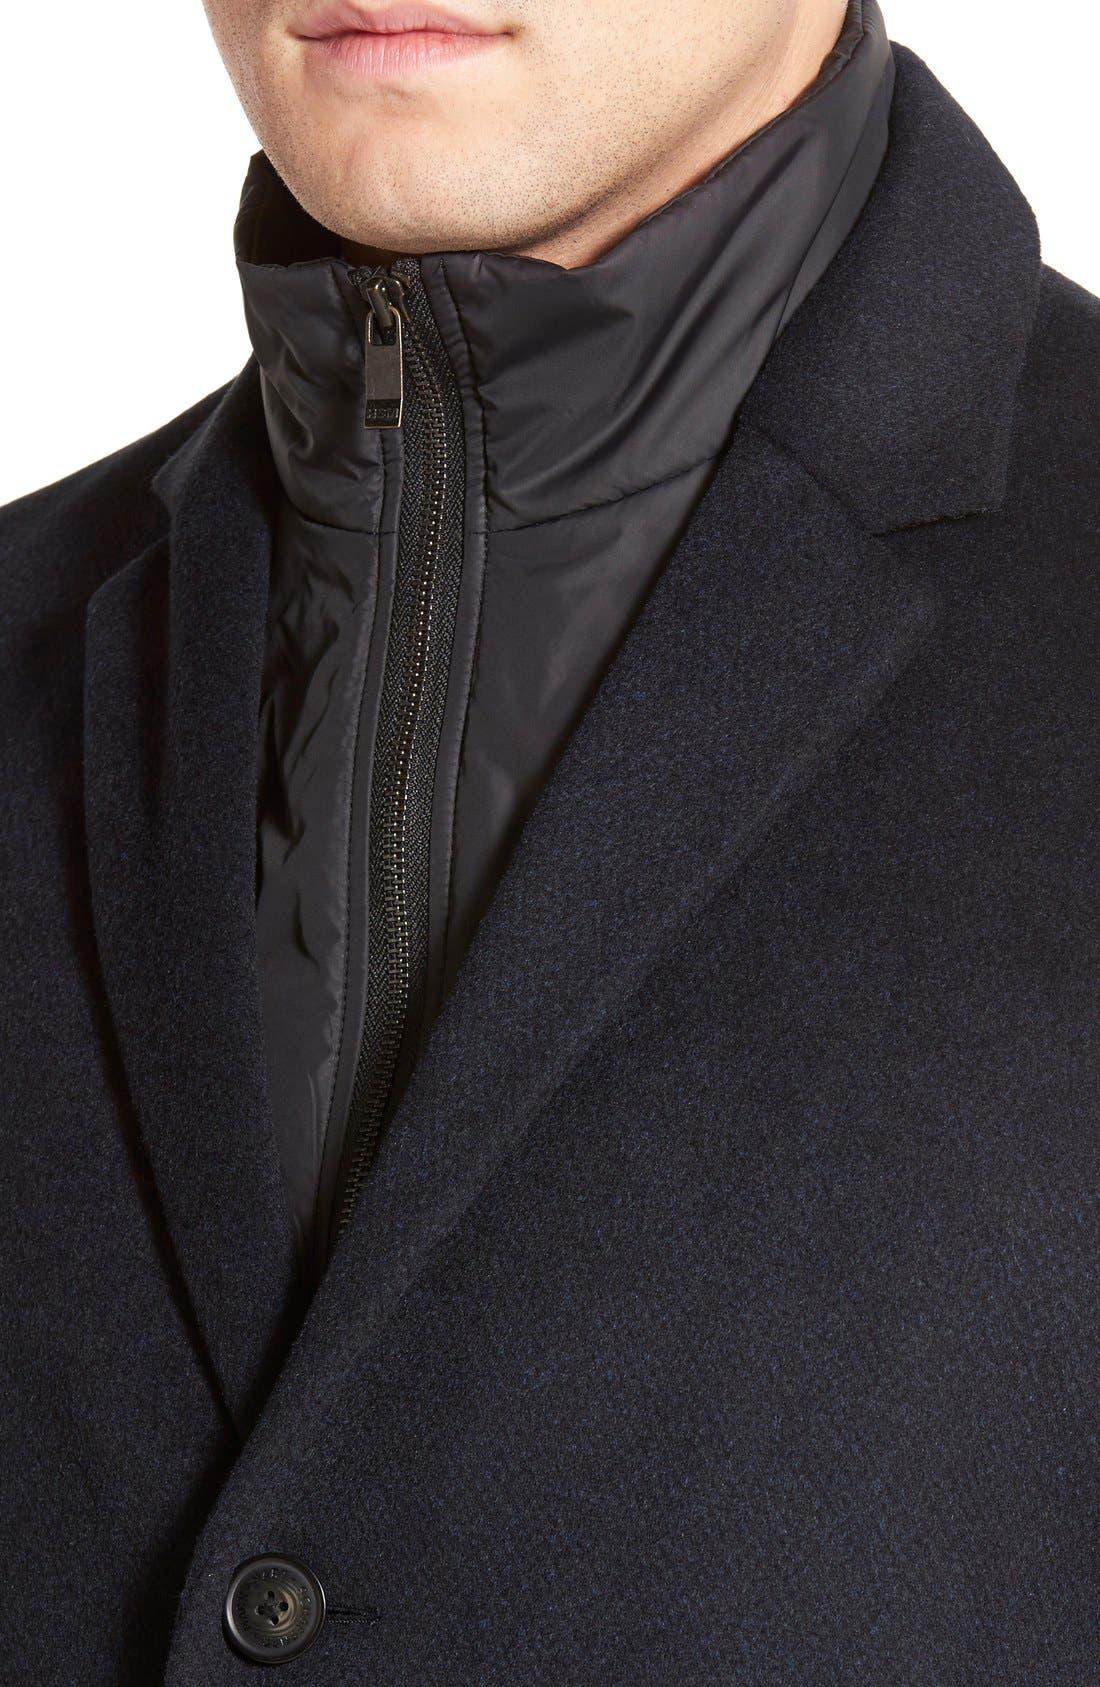 Kingman Modern Fit Wool Blend Coat with Removable Zipper Bib,                             Alternate thumbnail 8, color,